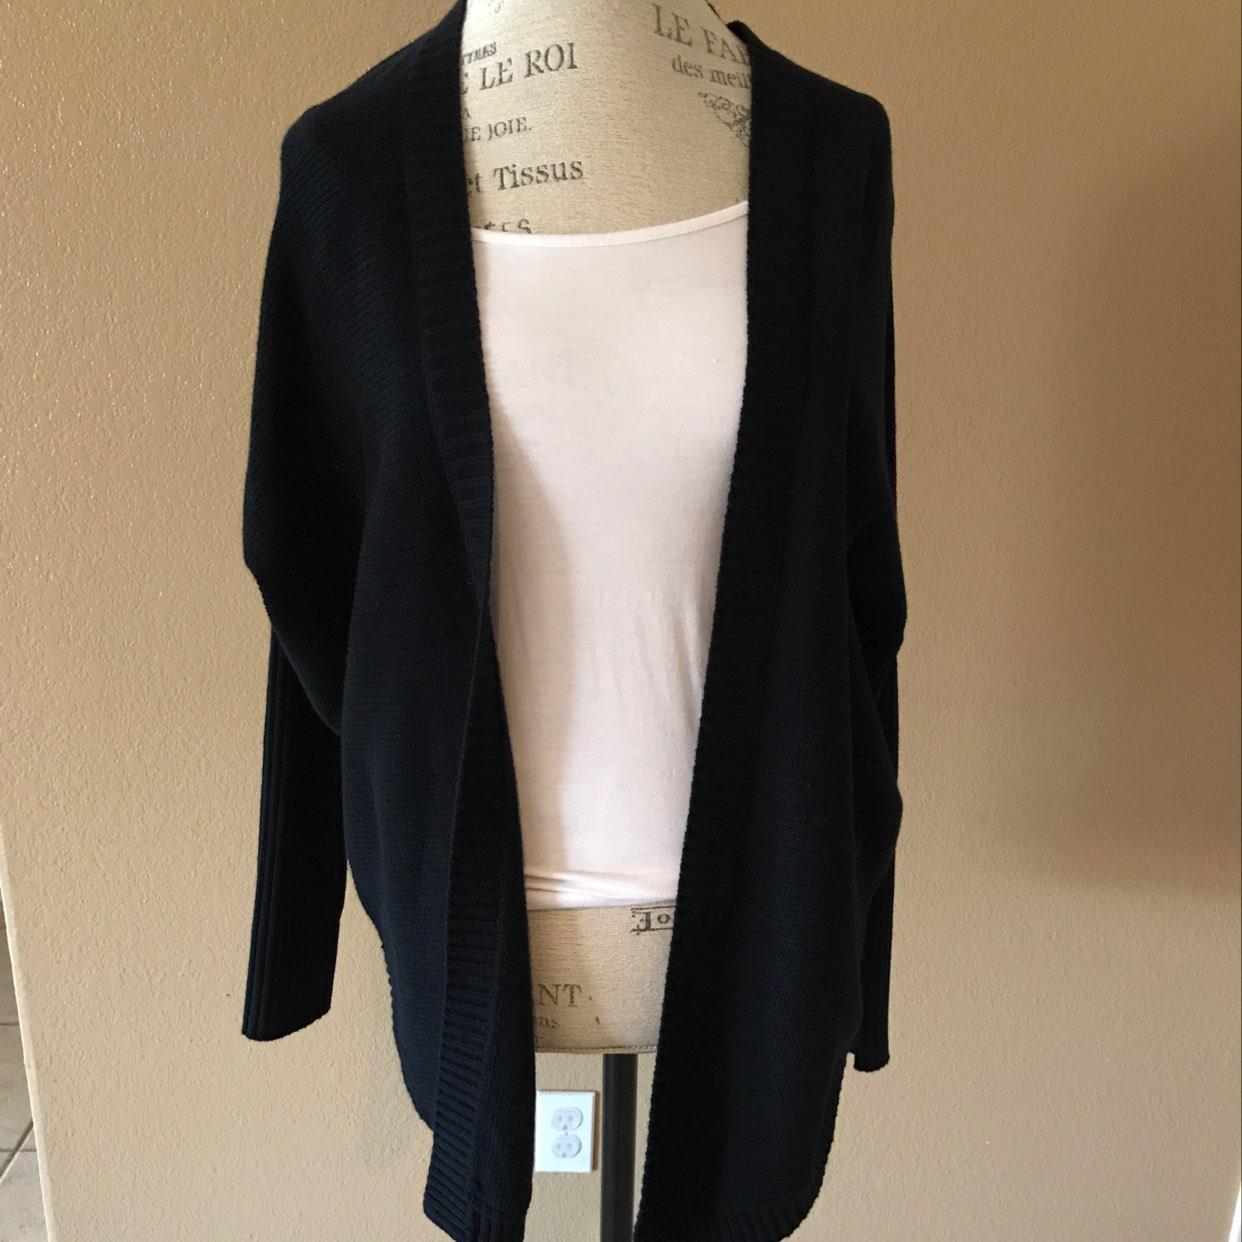 Express Black Cardigan Size Small Nwt - Mercari: BUY & SELL THINGS ...